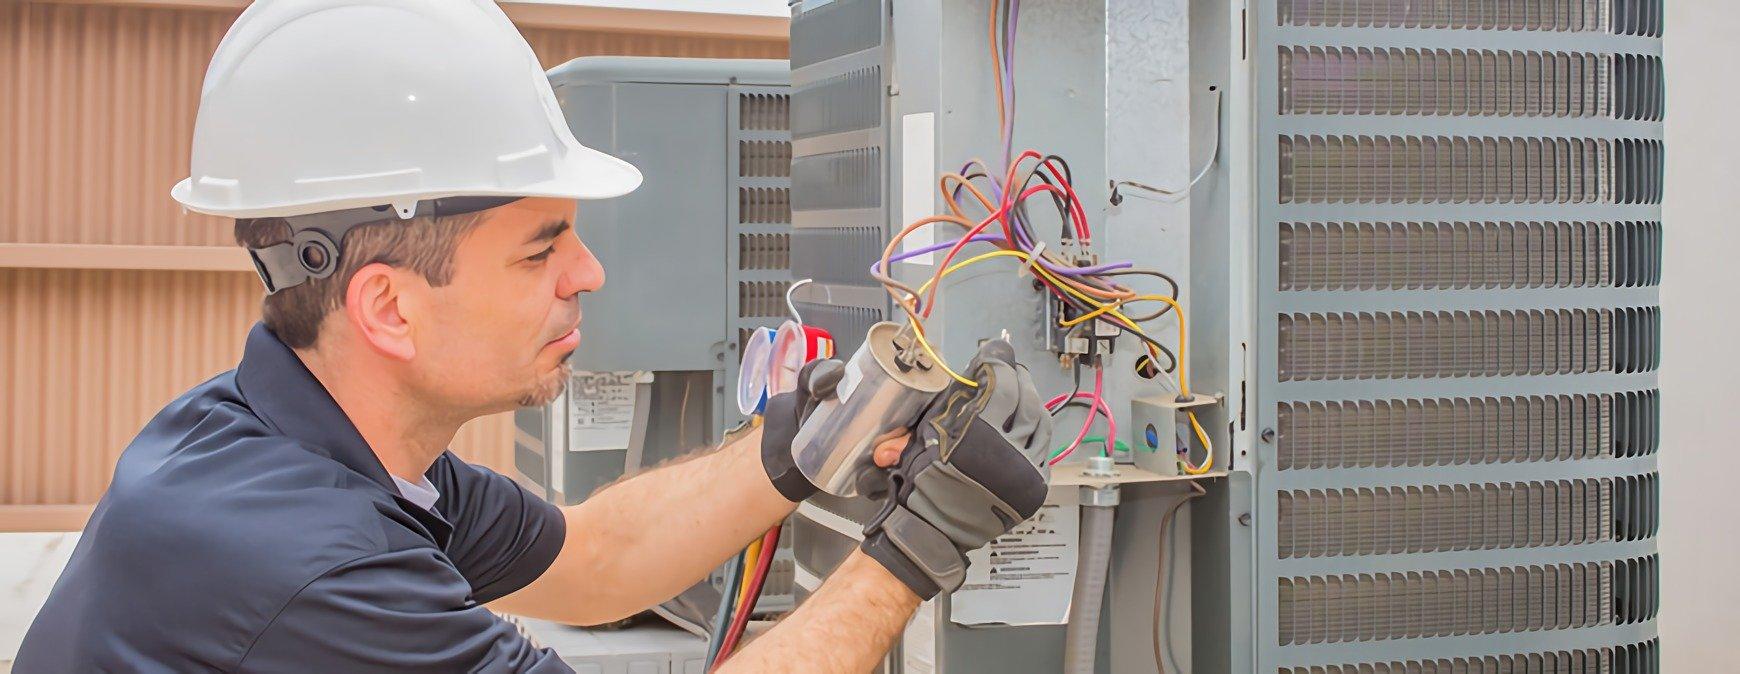 hvac technician using safety gloves